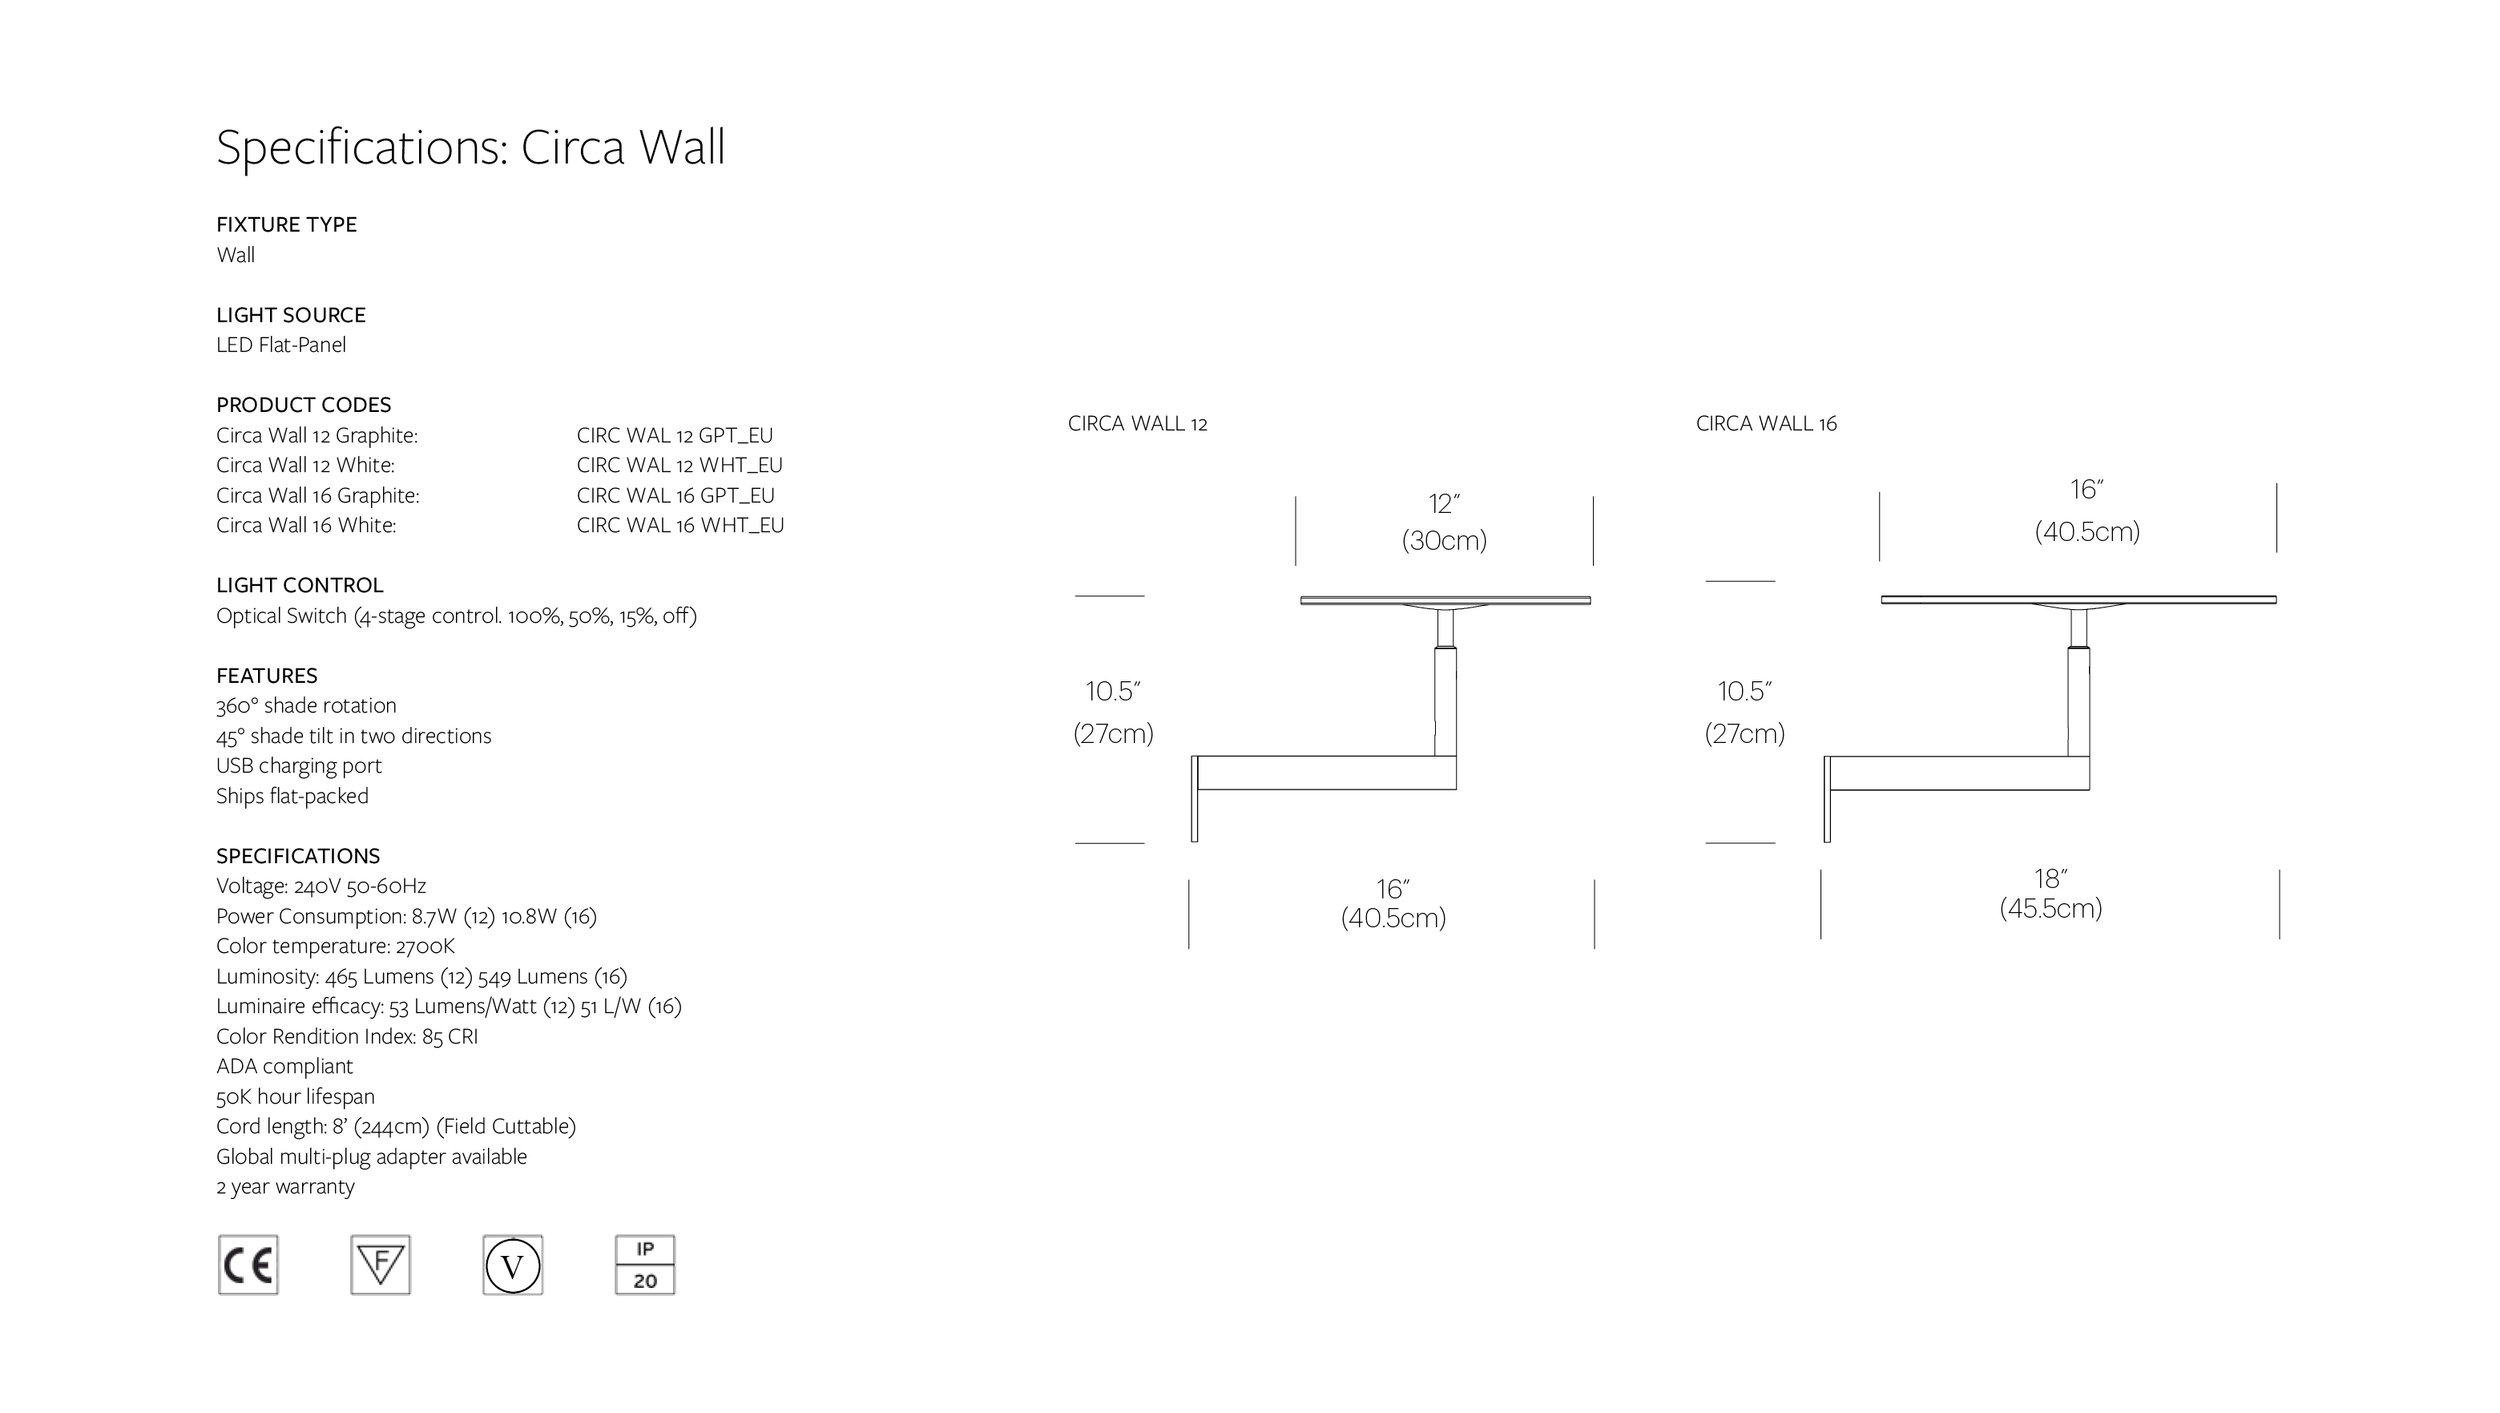 Circa Wall English Spec_240V.jpg